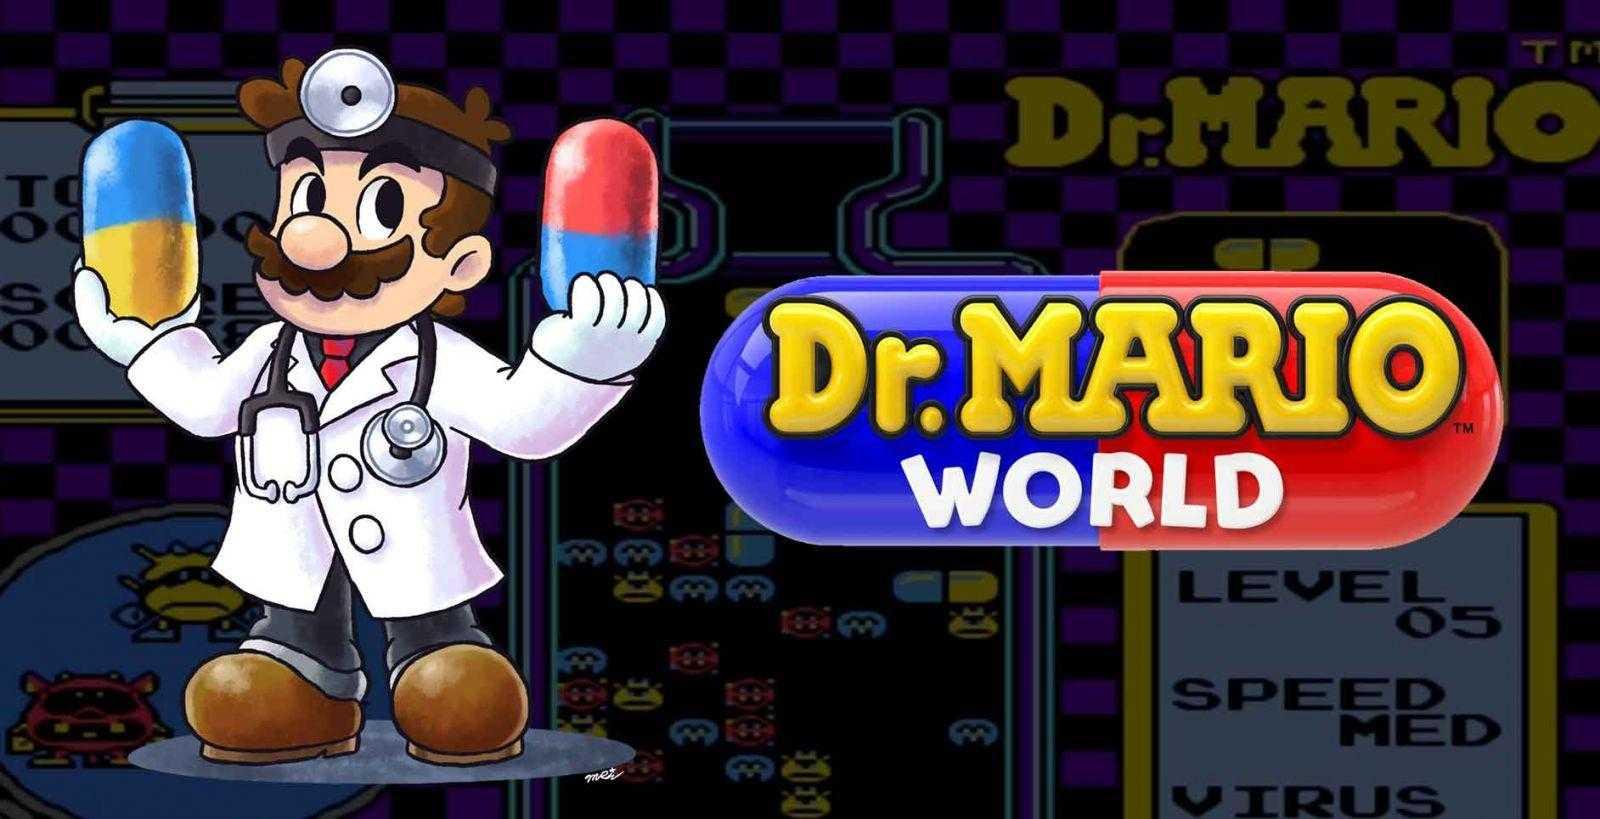 Игра Dr. Mario World от Nintendo выйдет на iOS и Android летом (DR Mario World)